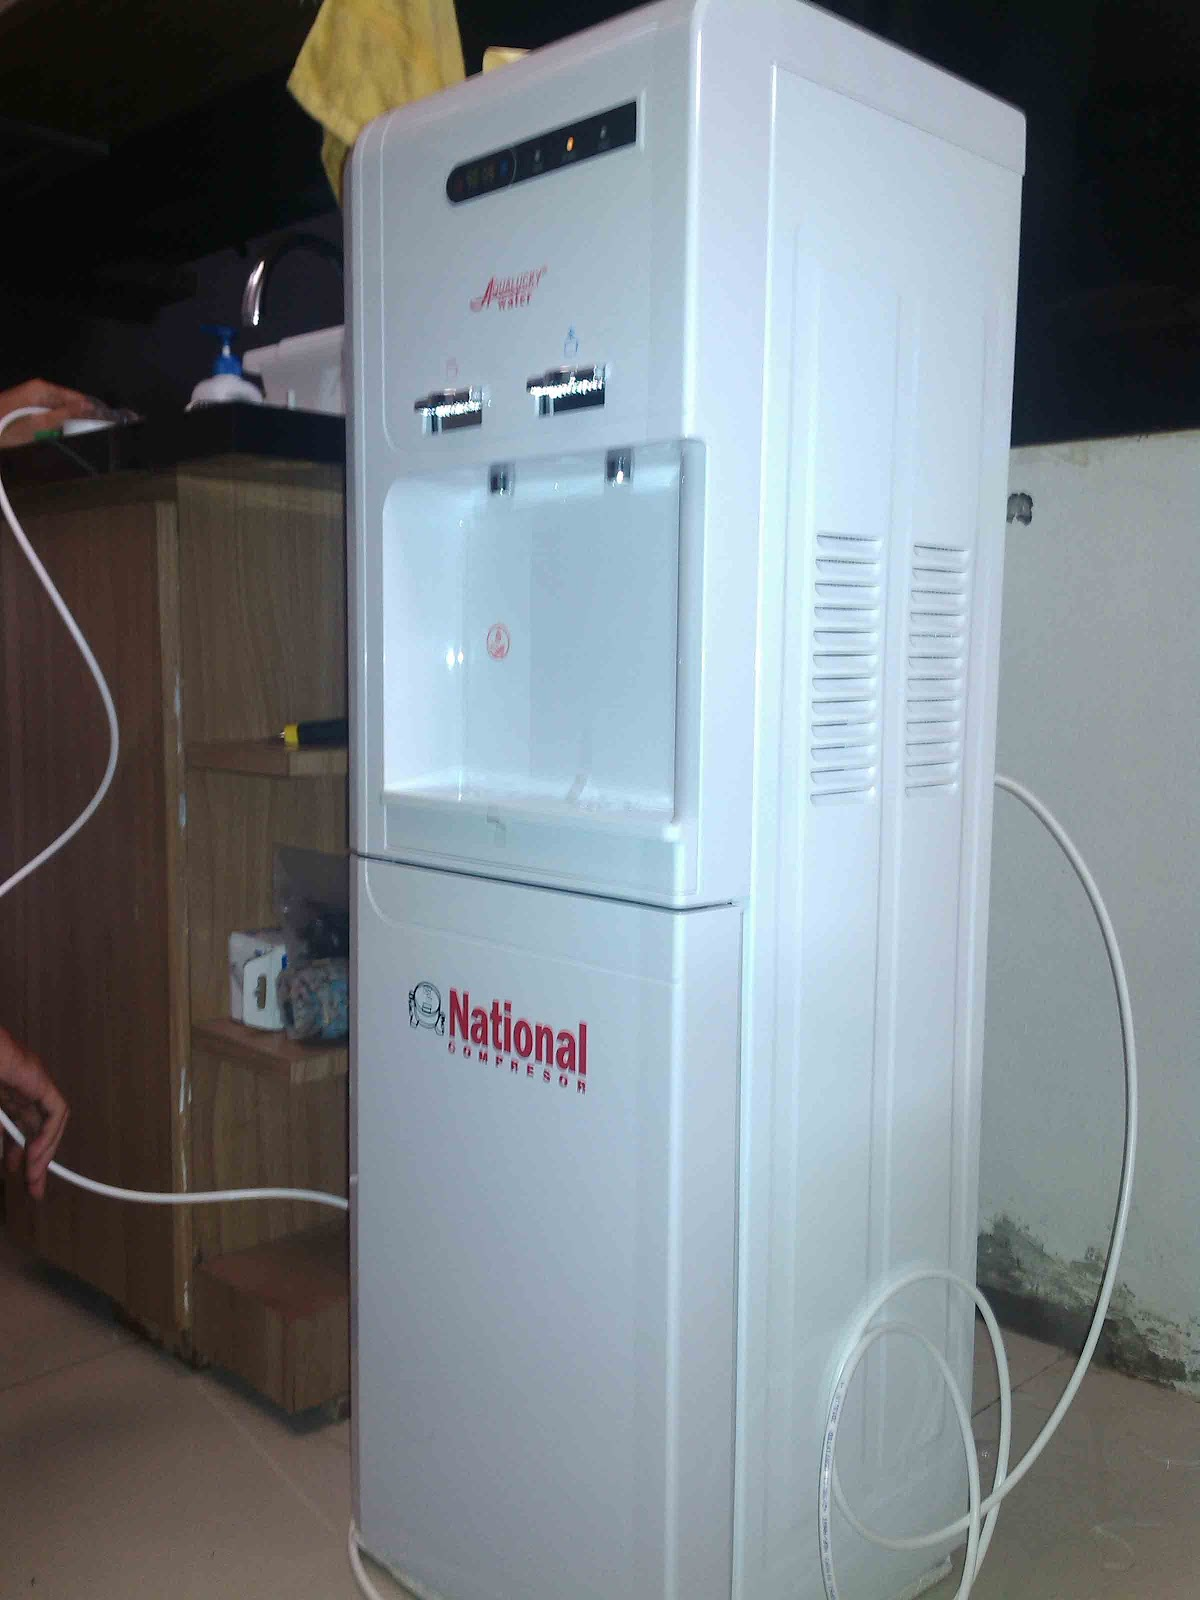 jual reverses osmosis rumah tangga dan industri di bandung, jakarta, solo, surabaya, dispenser